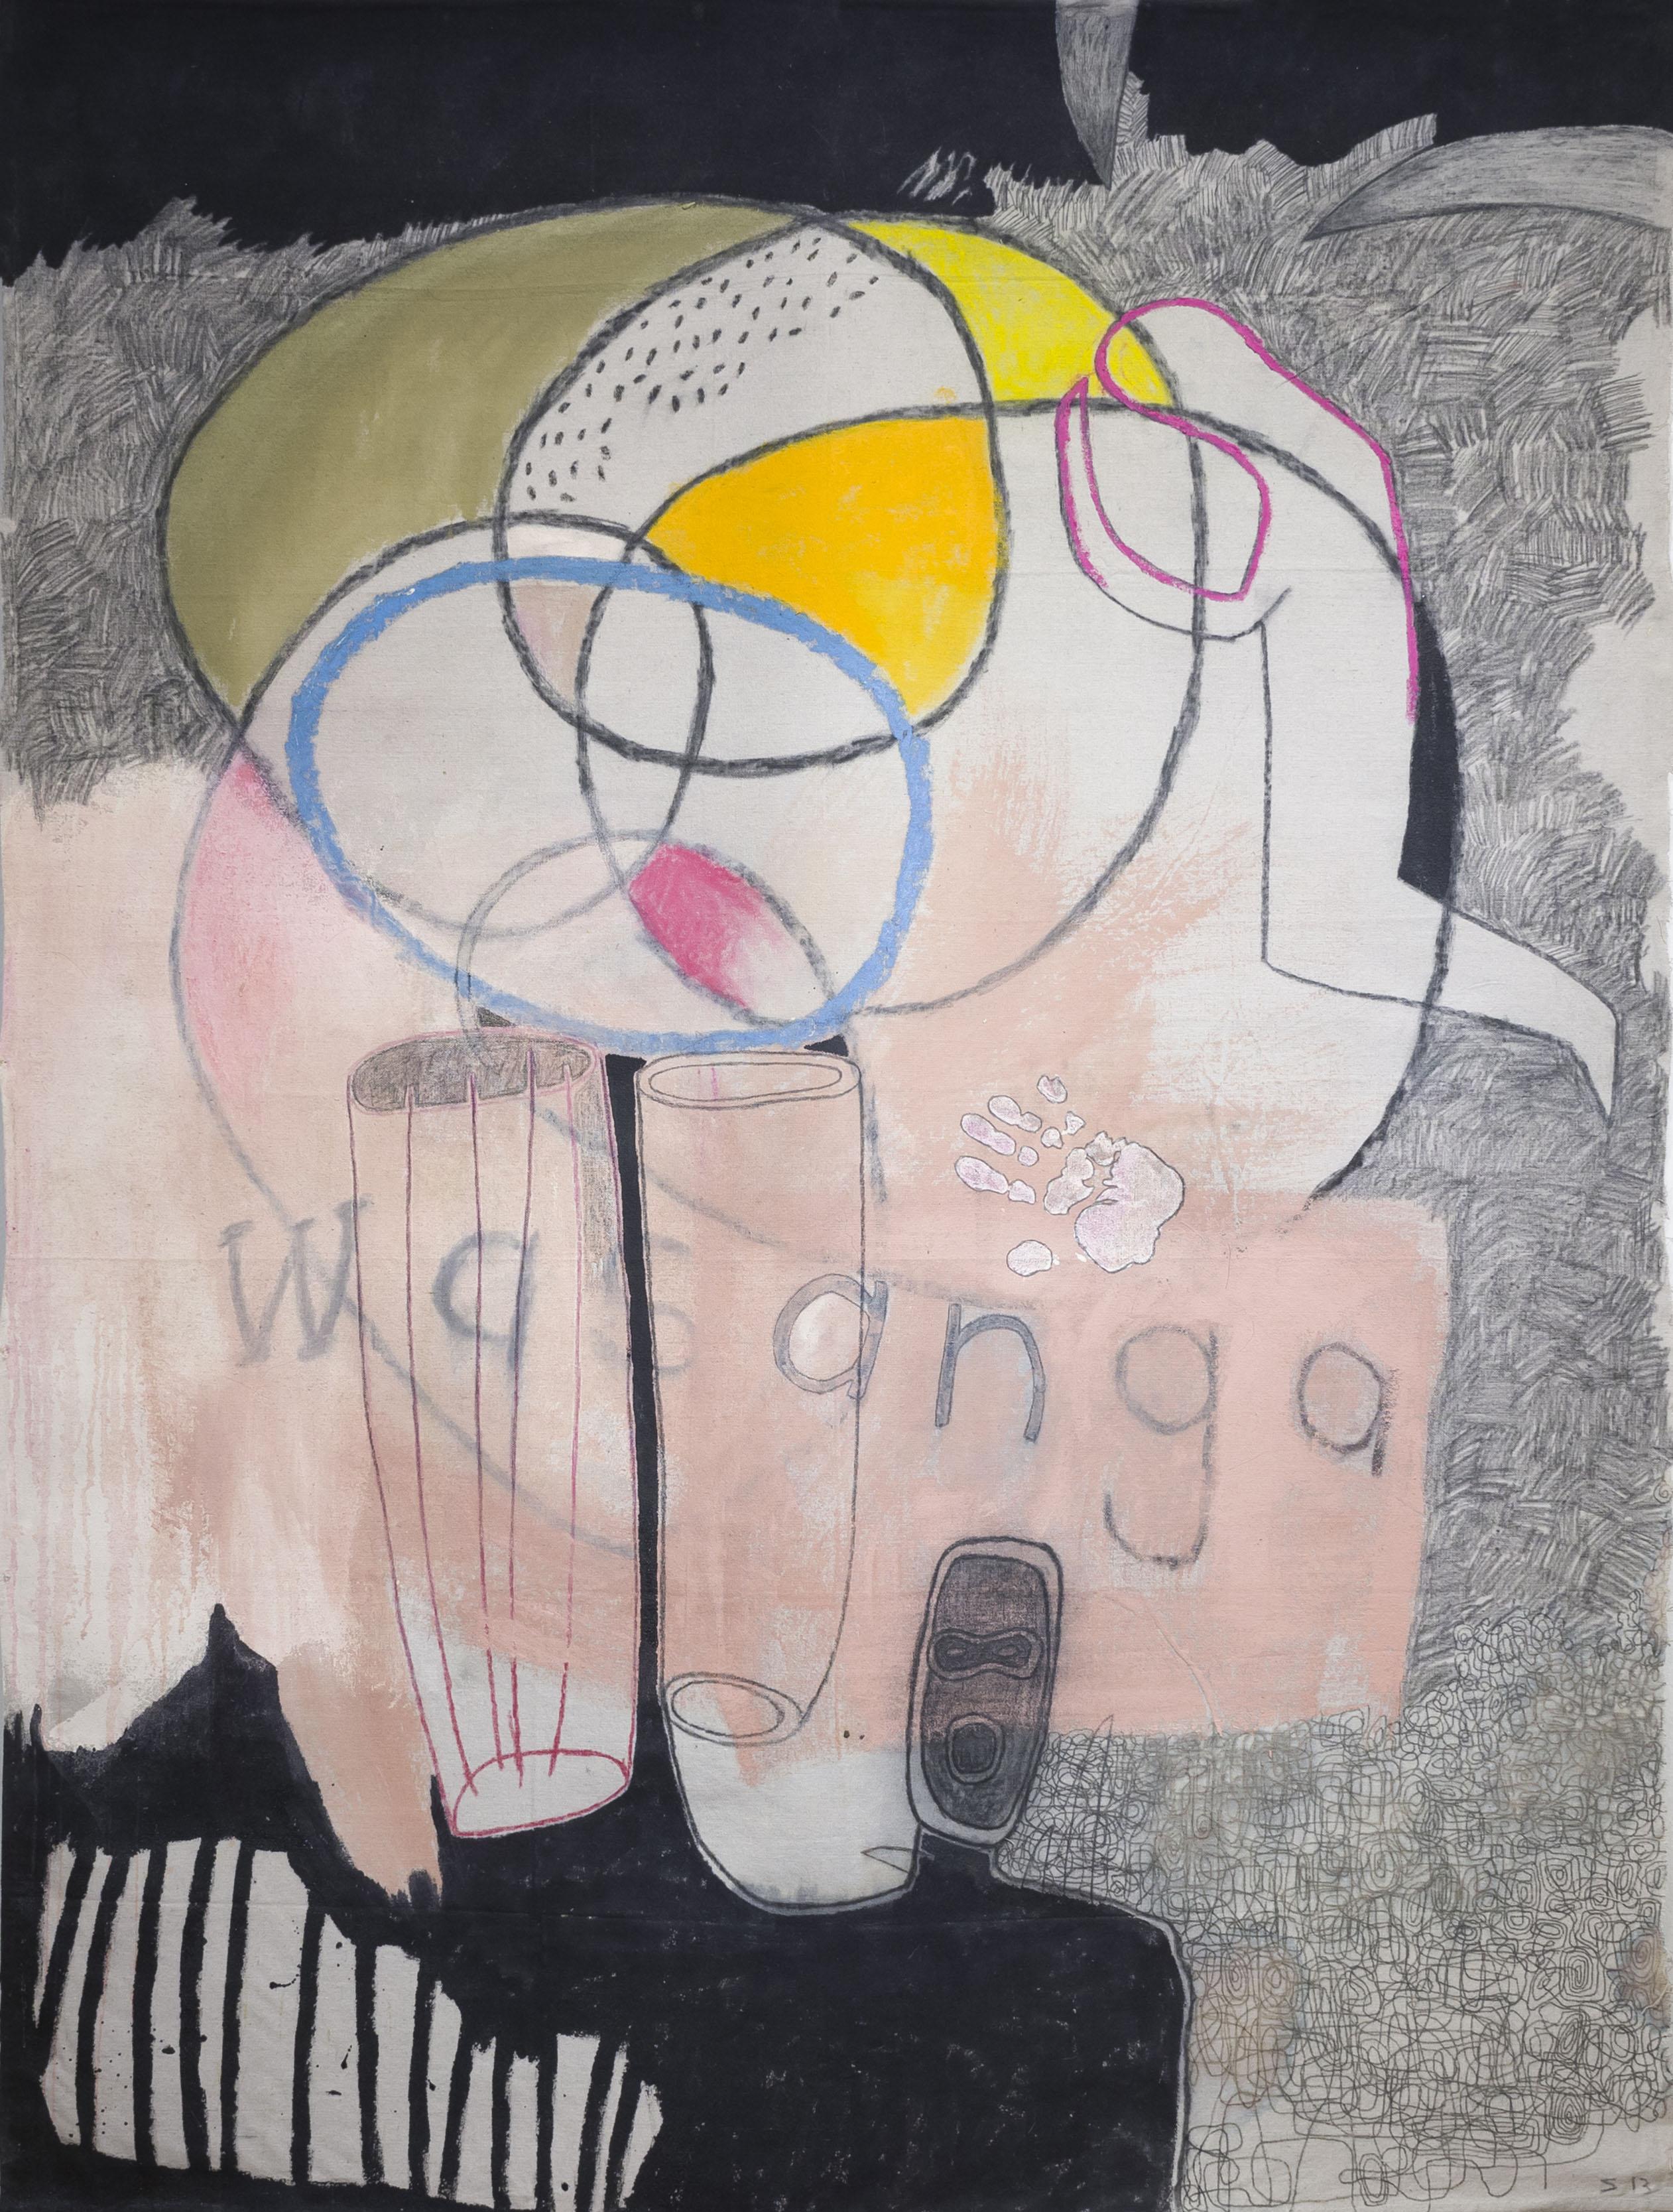 Sergio Garcia - Wasanga Man, 2013